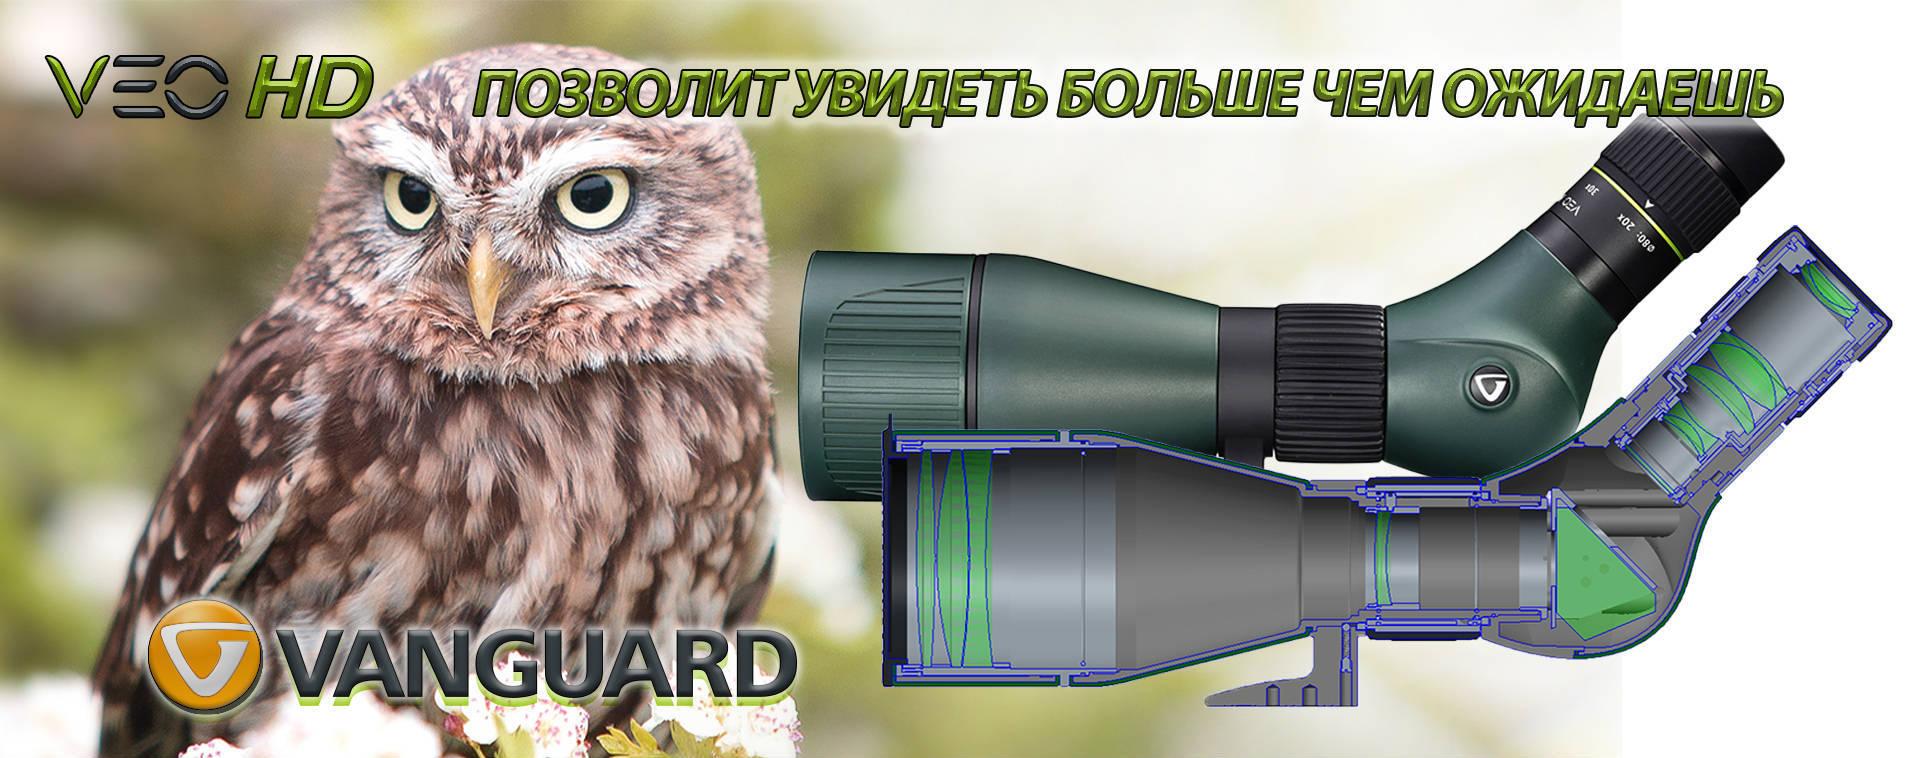 Vanguard VEO HD 80